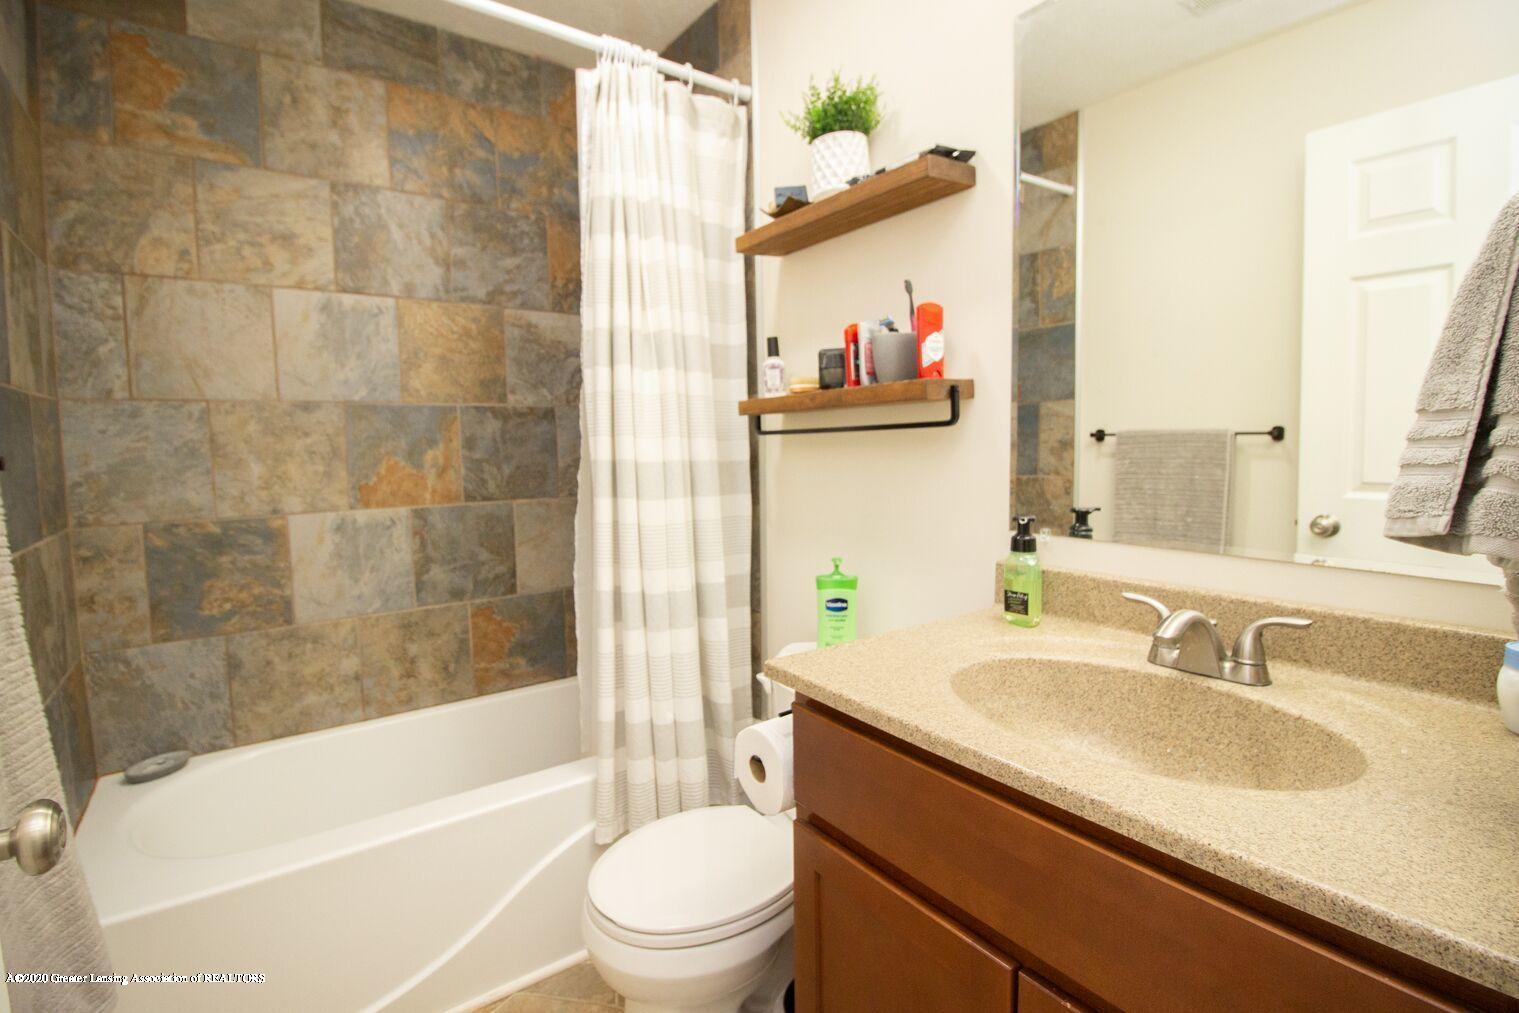 2231 Vandecarr Rd - bath room - 10